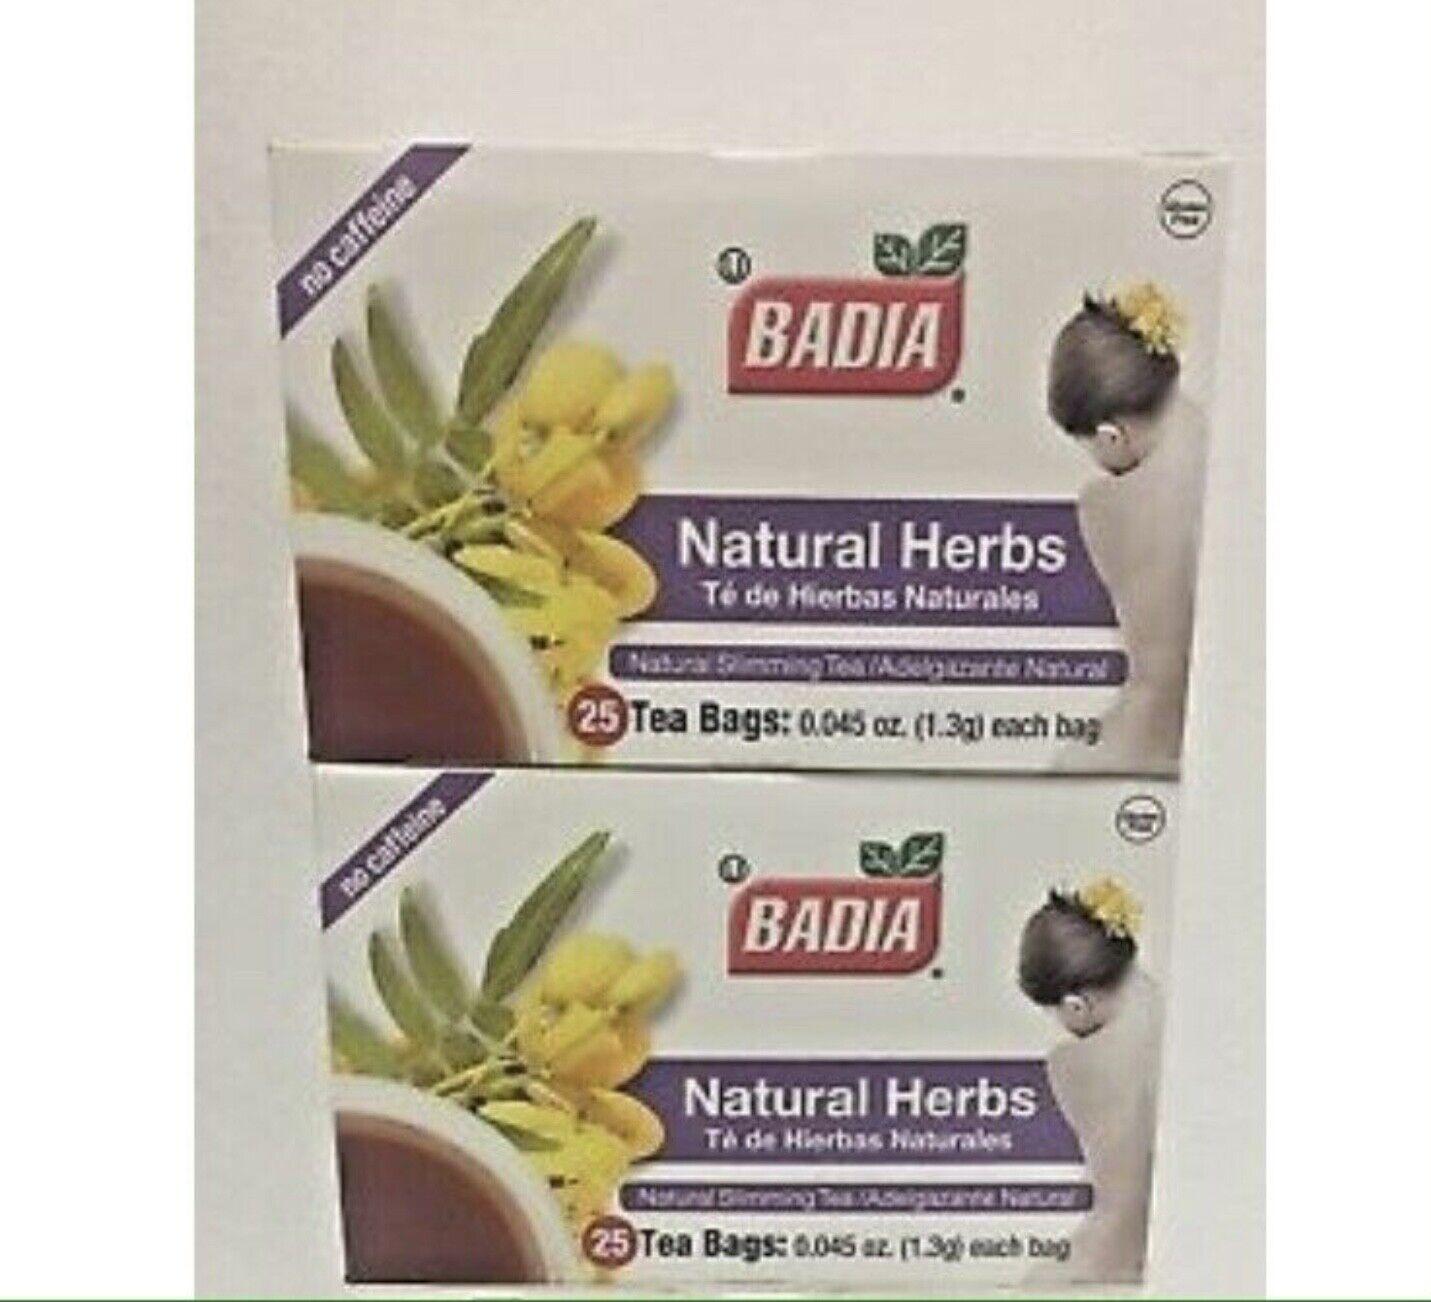 badia herbs natural slimming ceai)